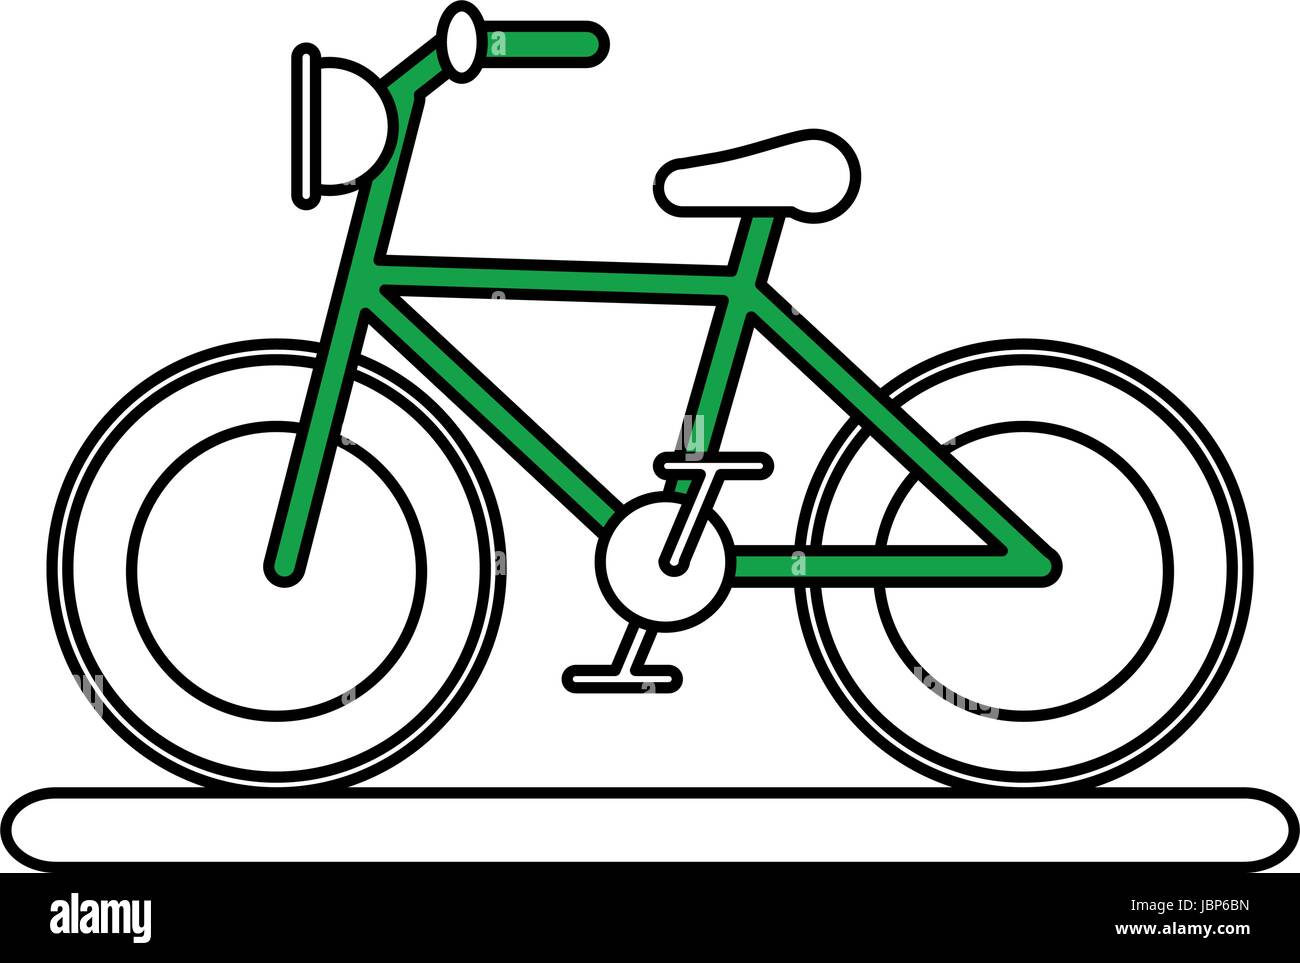 bycicle flat illustration - Stock Image